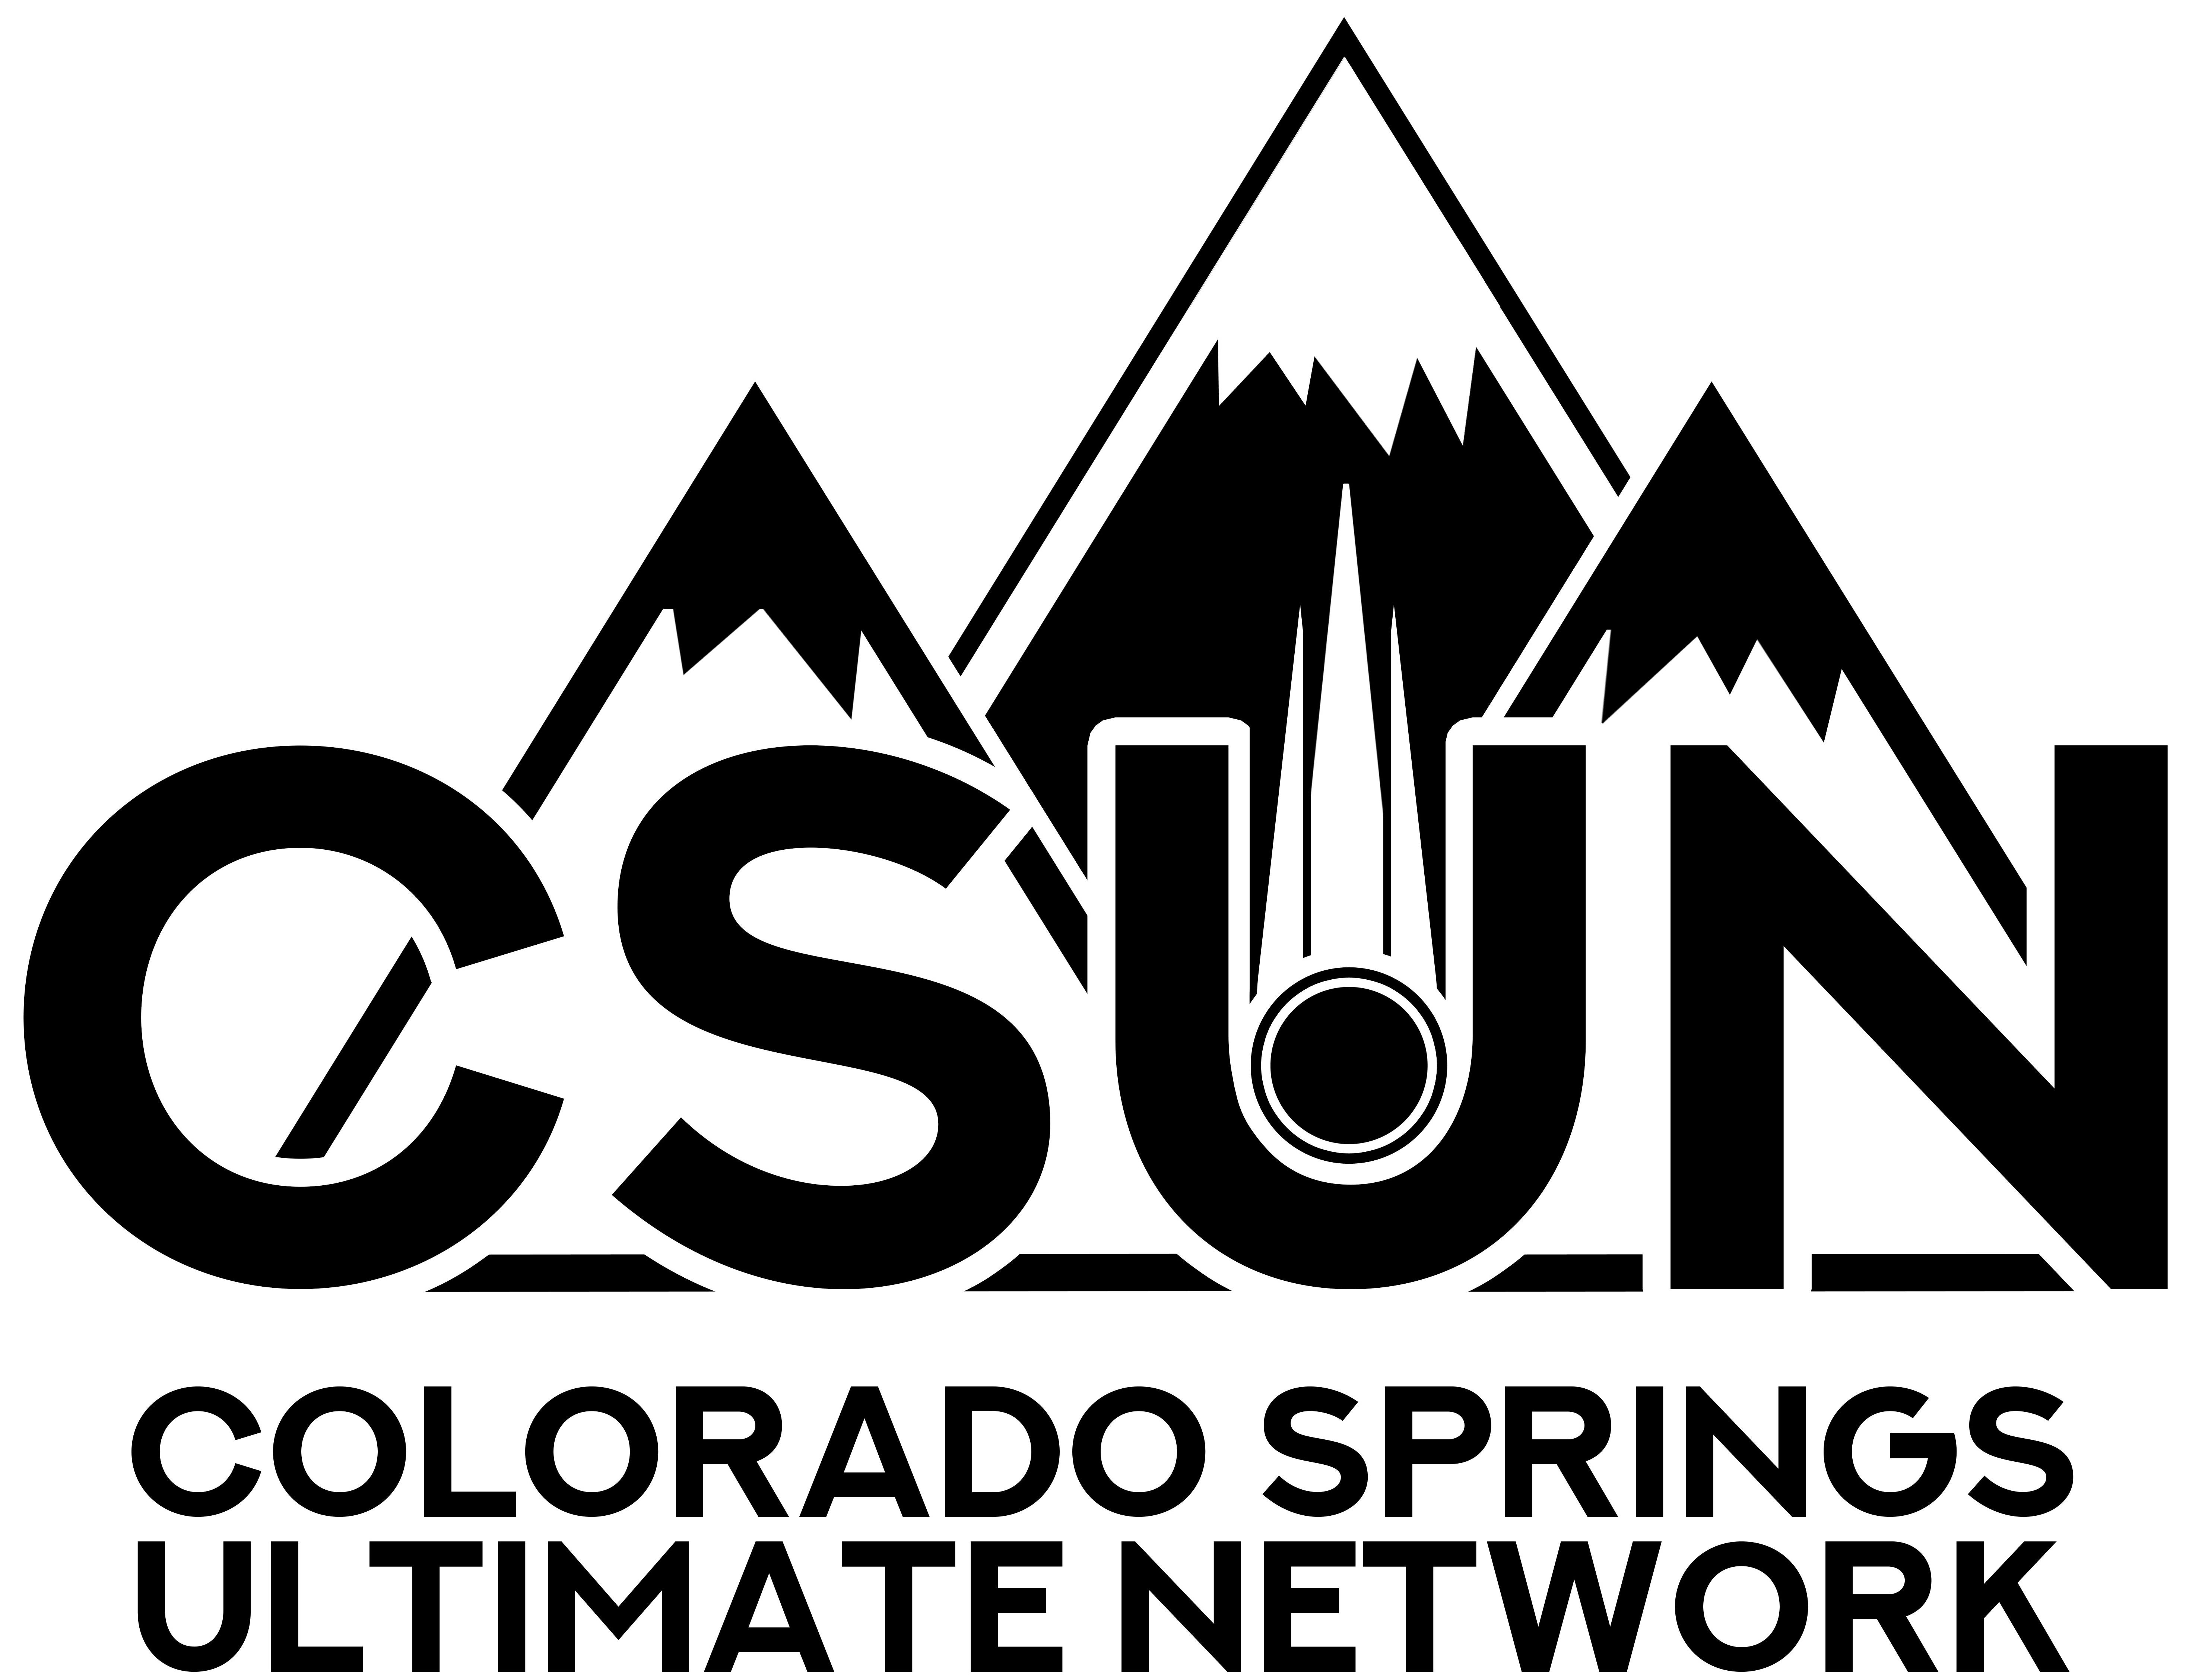 Csun Calendar Fall 2020.Ultimate Frisbee Colorado Springs Everything Ultimate